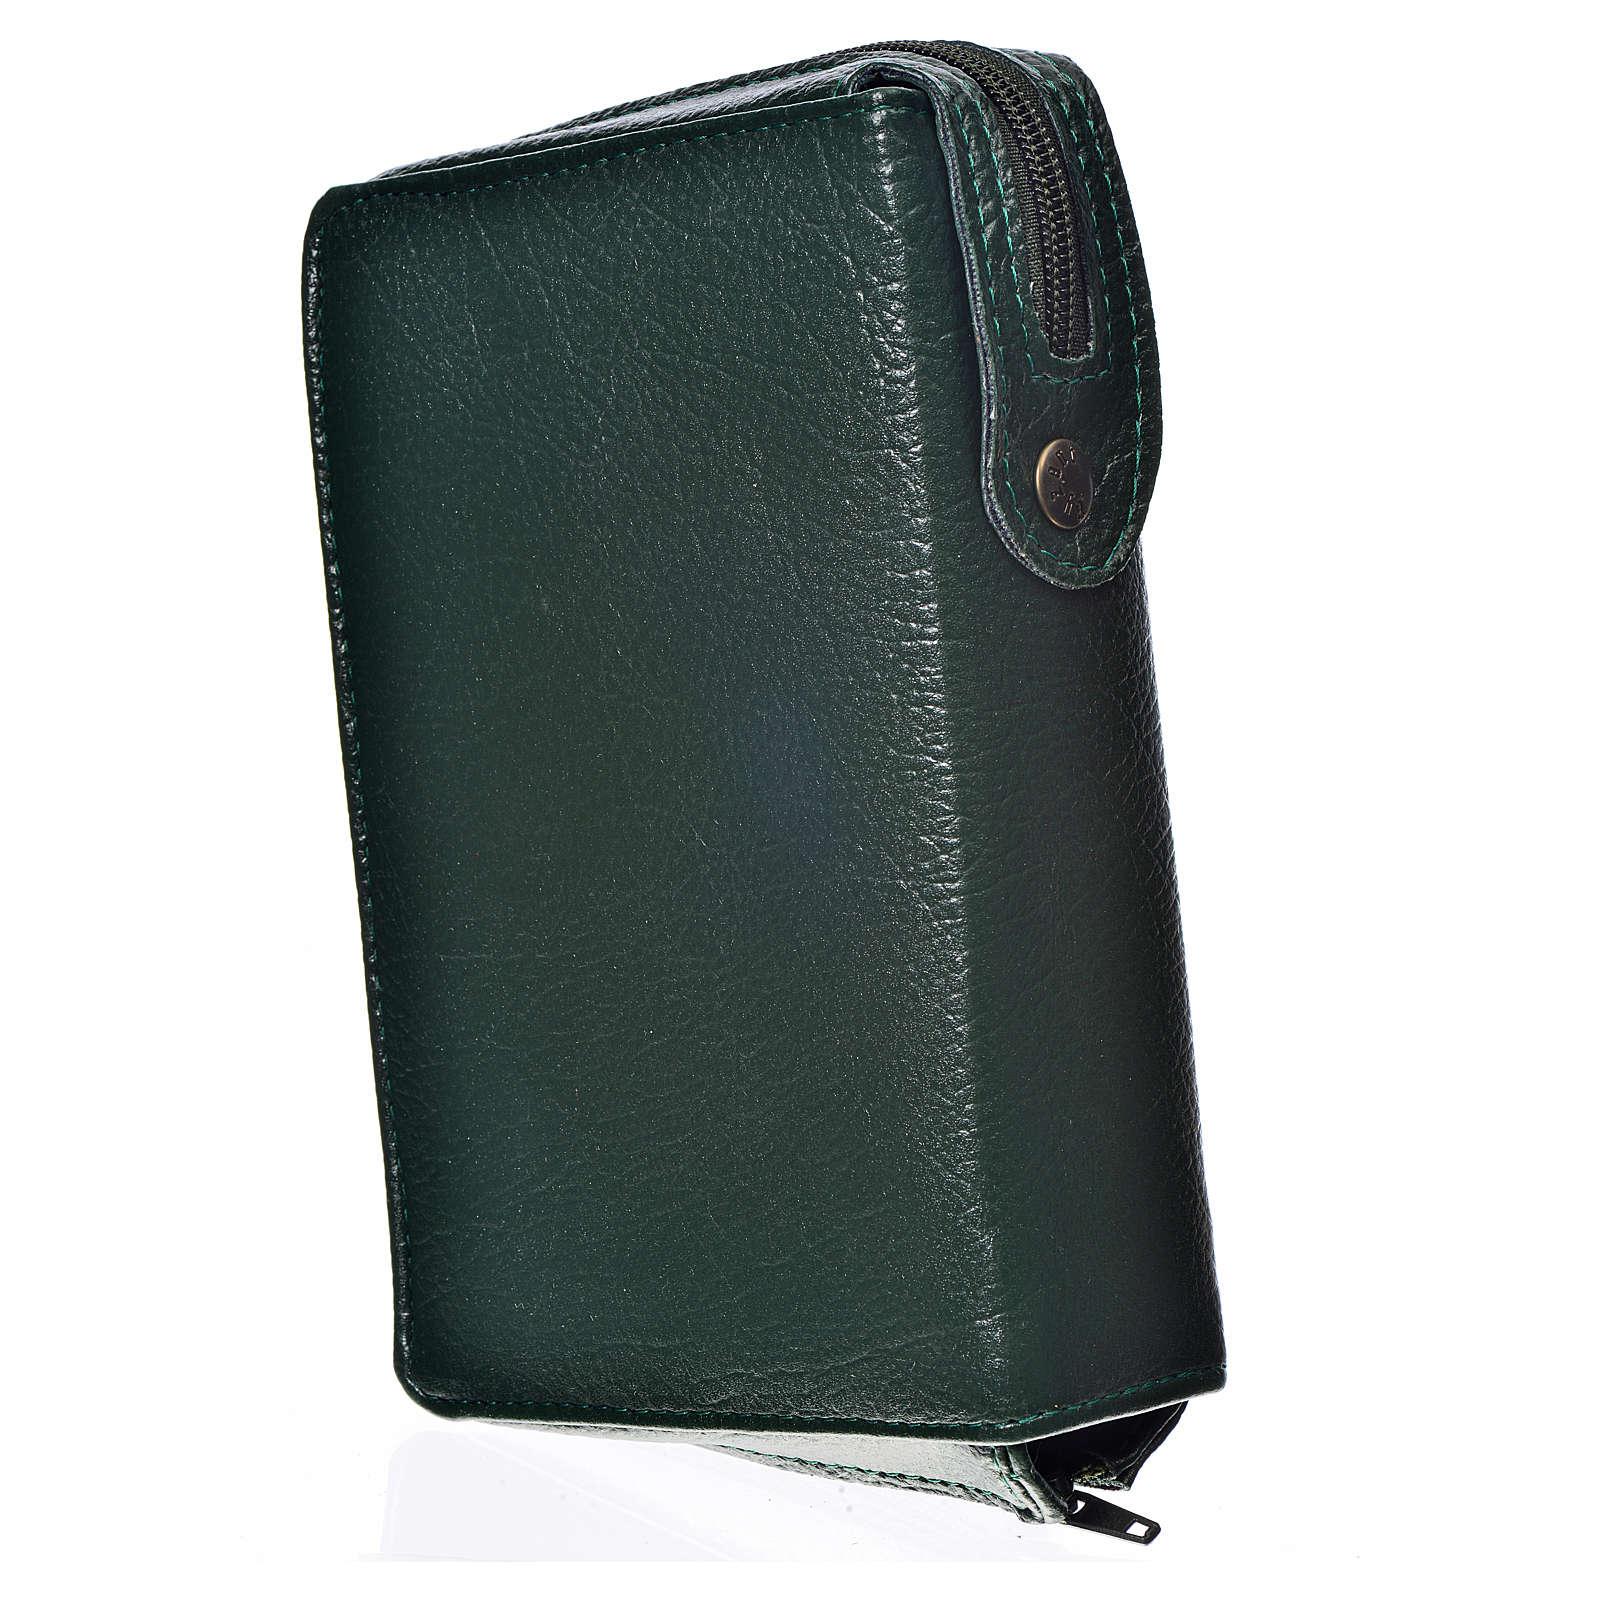 Funda Sagrada Biblia CEE ED. Pop. verde simil cuero Pantocrator 4